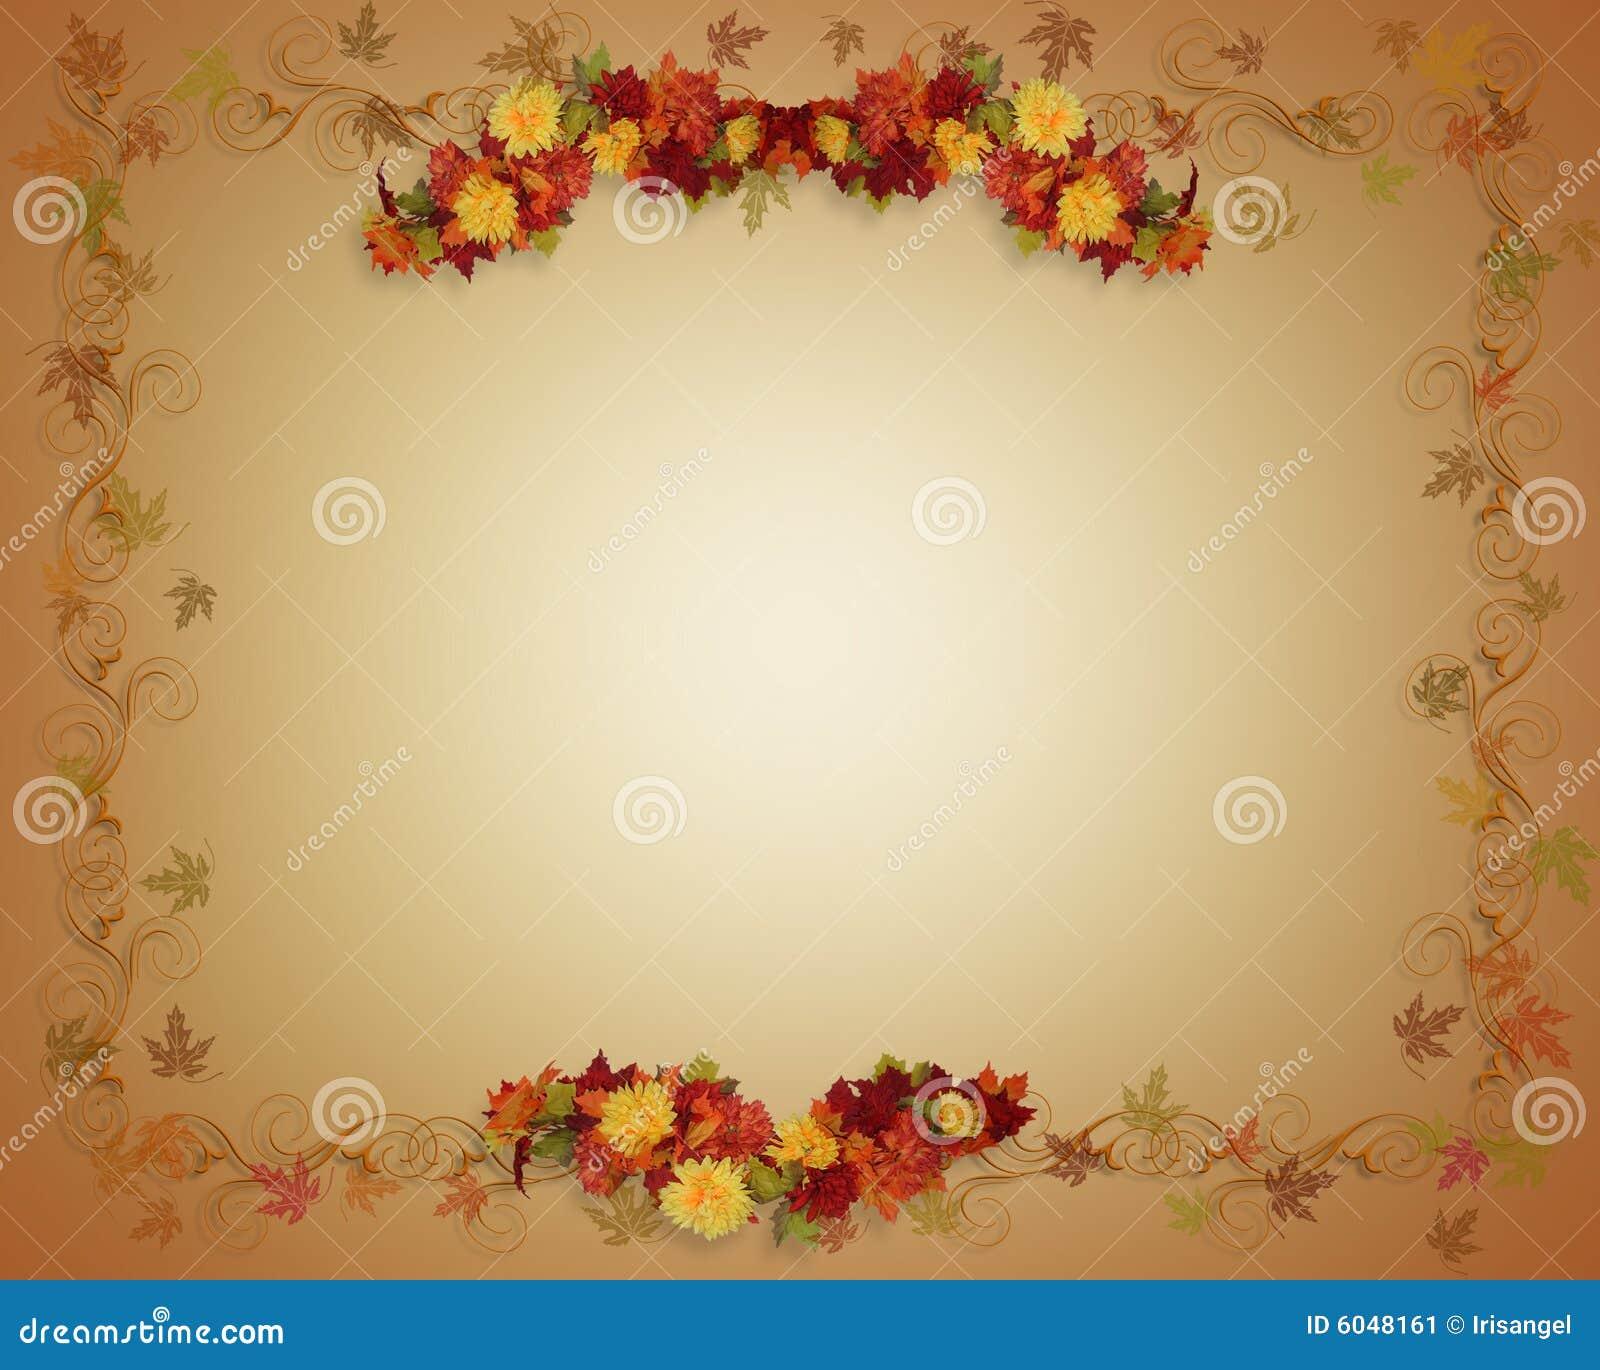 Fall Leaves Autumn Background Stock Image Image 6048161